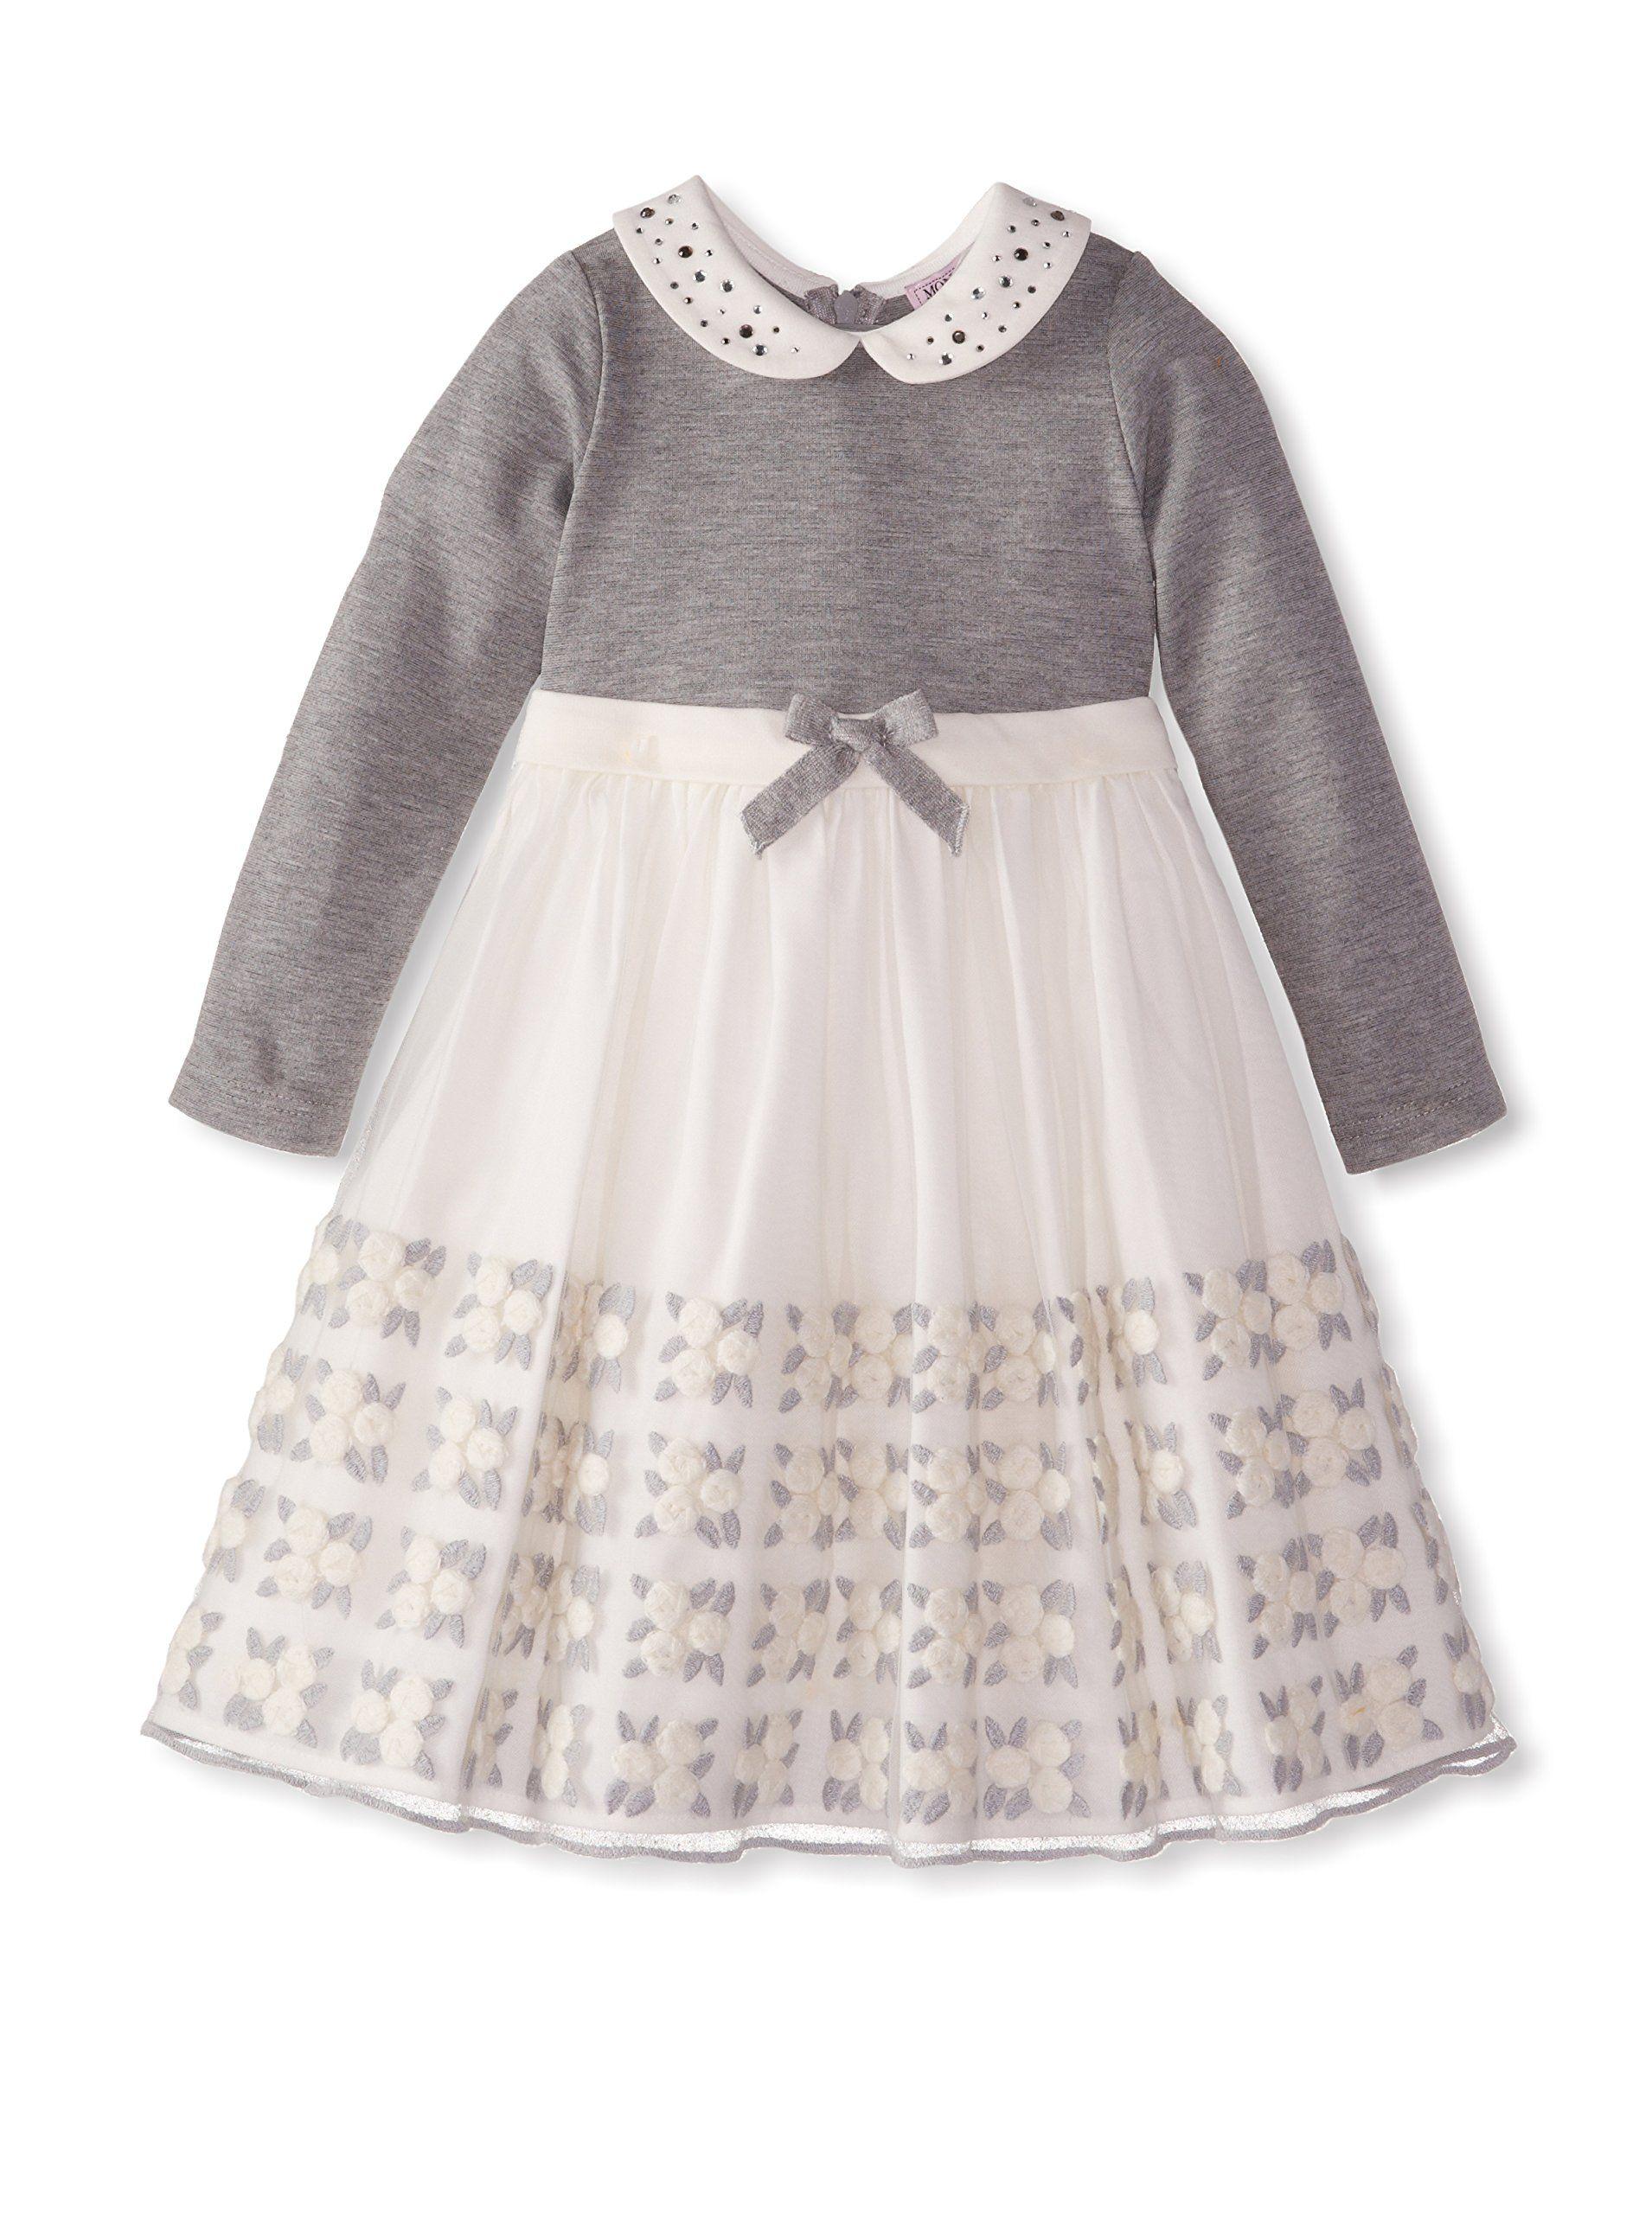 Monnalisa Bebe Kid's Two Tone Dress at MYHABIT